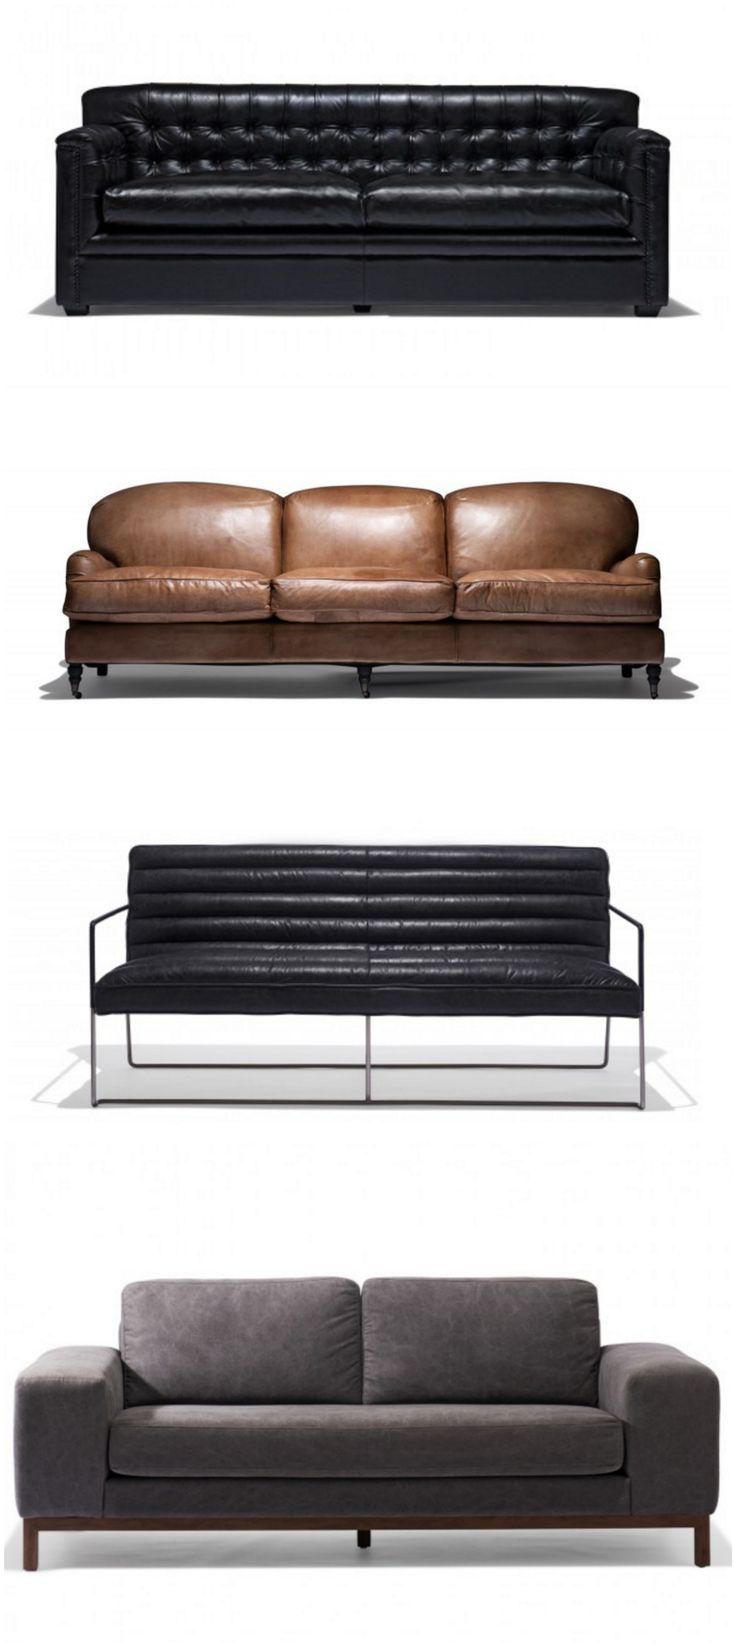 Mejores 108 imágenes de sofas idea en Pinterest   Sala de estar ...